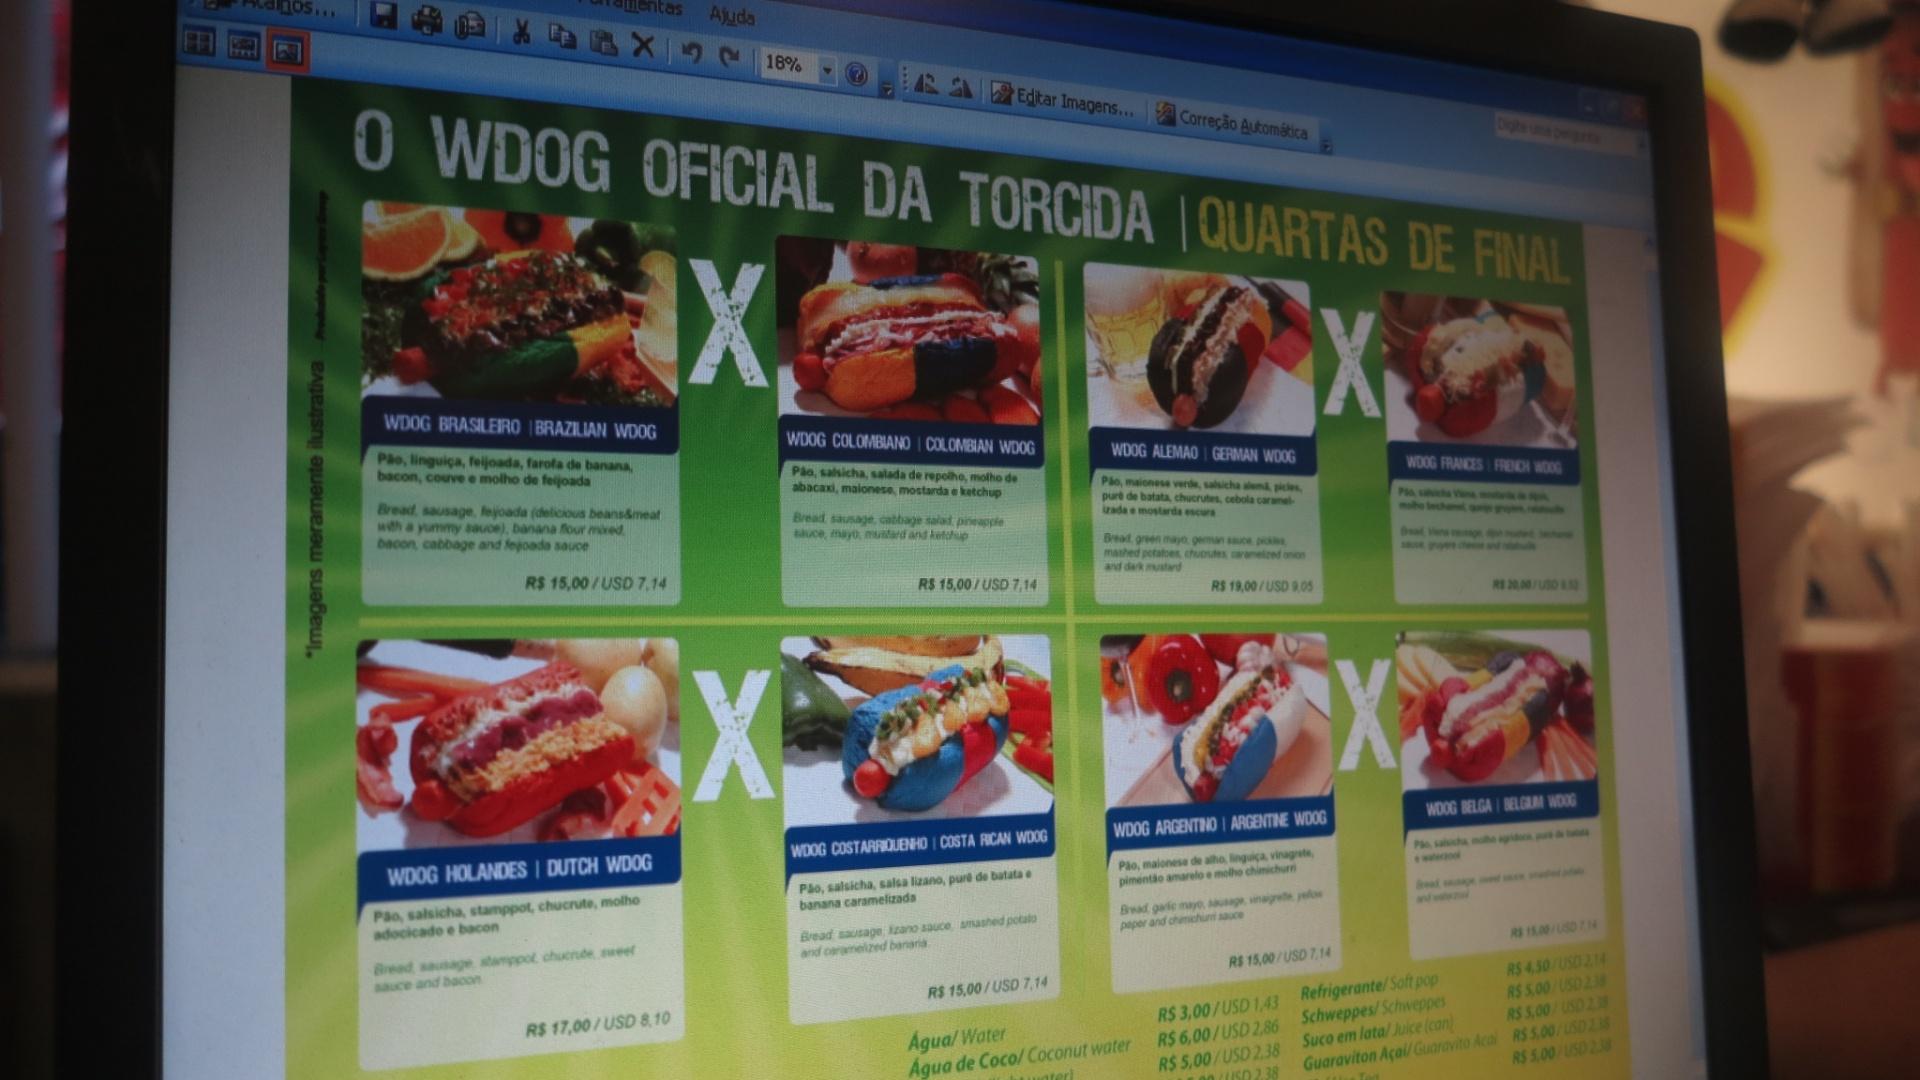 Quiosque WDog, no metrô Itaquera, aposta na onda dos hot-dogs temáticos e faz cardápio especial para as quartas de final da Copa do Mundo.